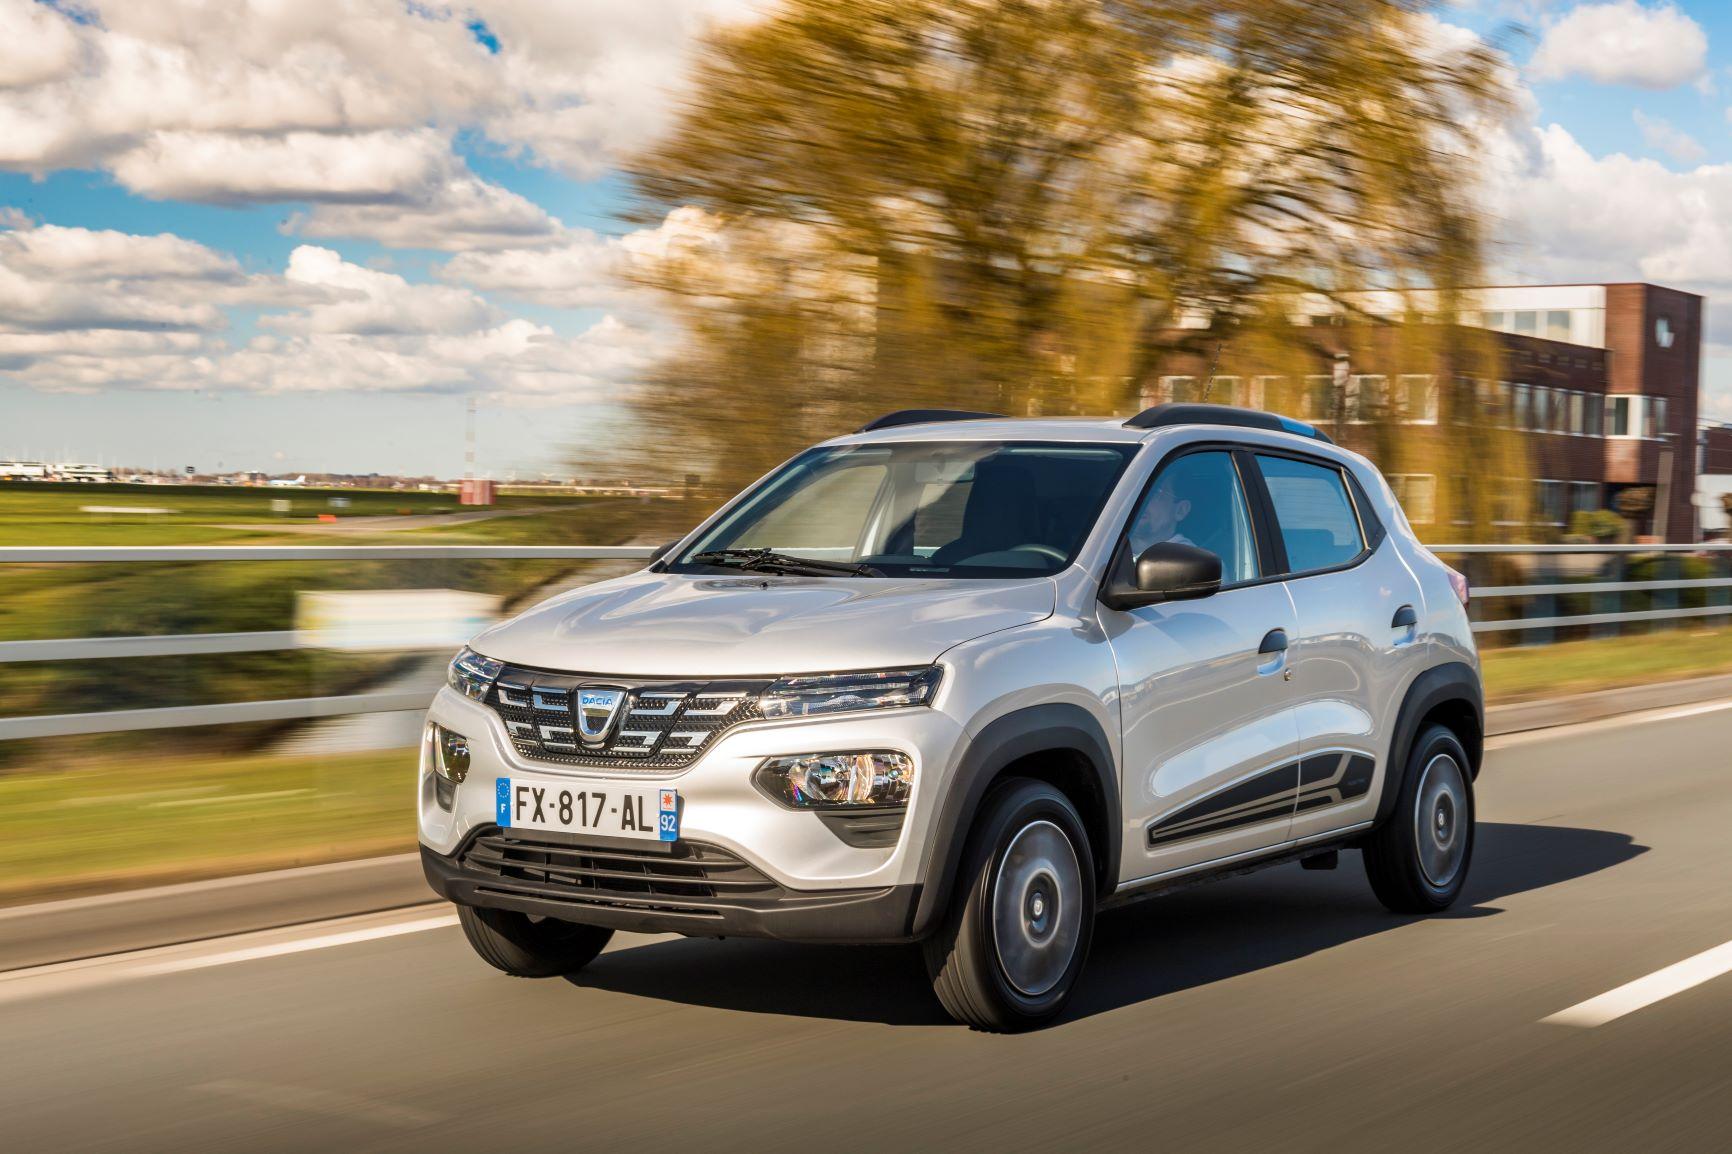 Dacia Spring jõuab Eestisse septembris